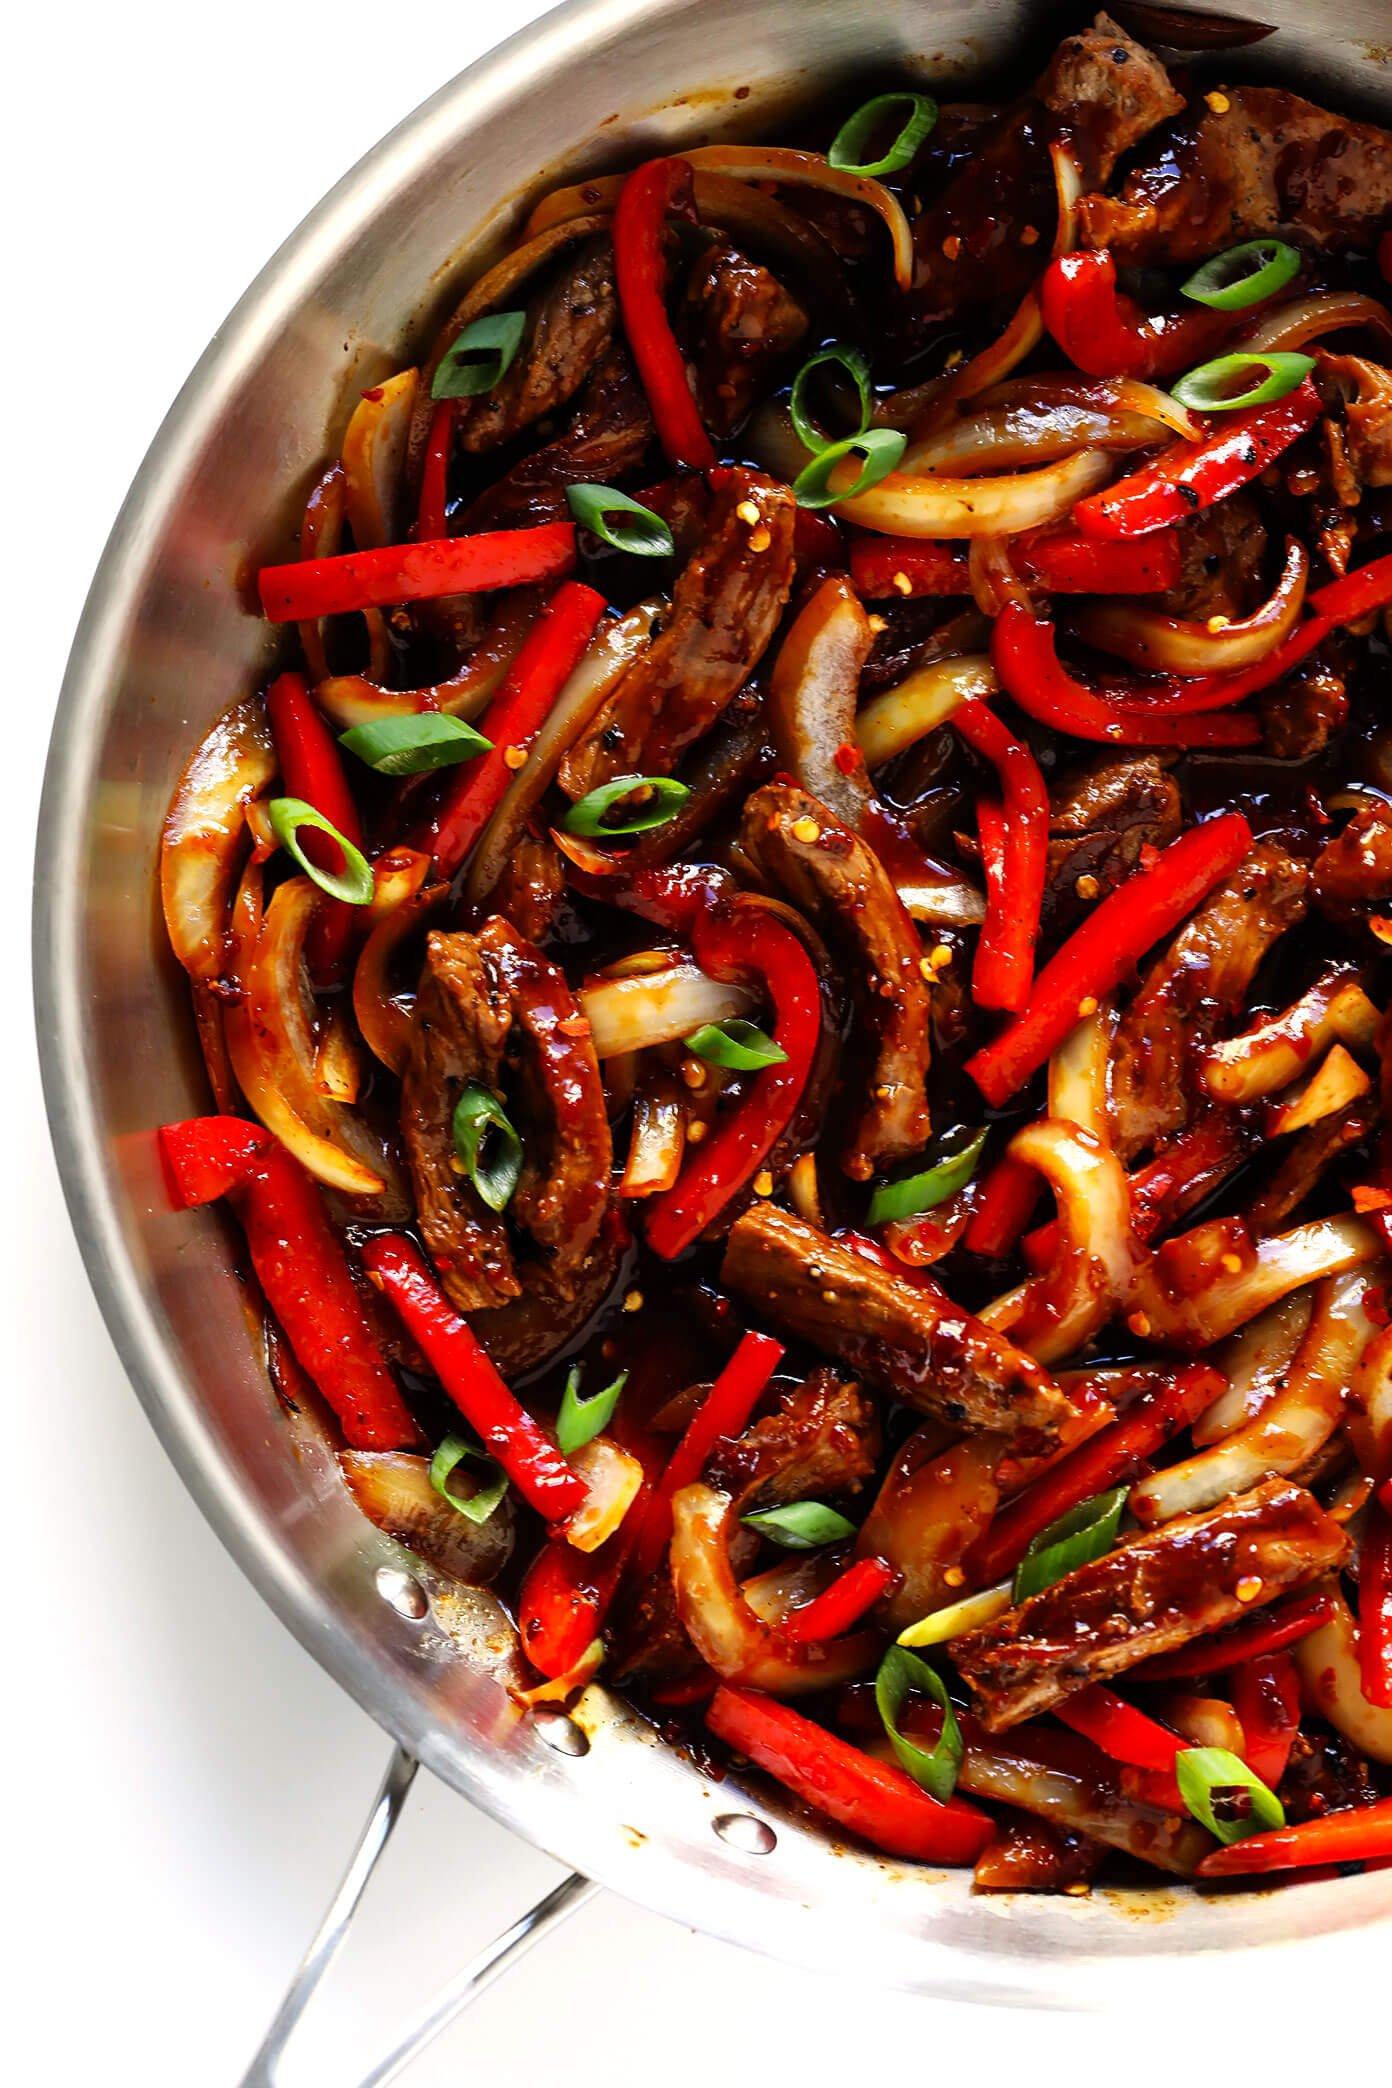 Sizzlin' Spicy Szechuan Stir-Fry